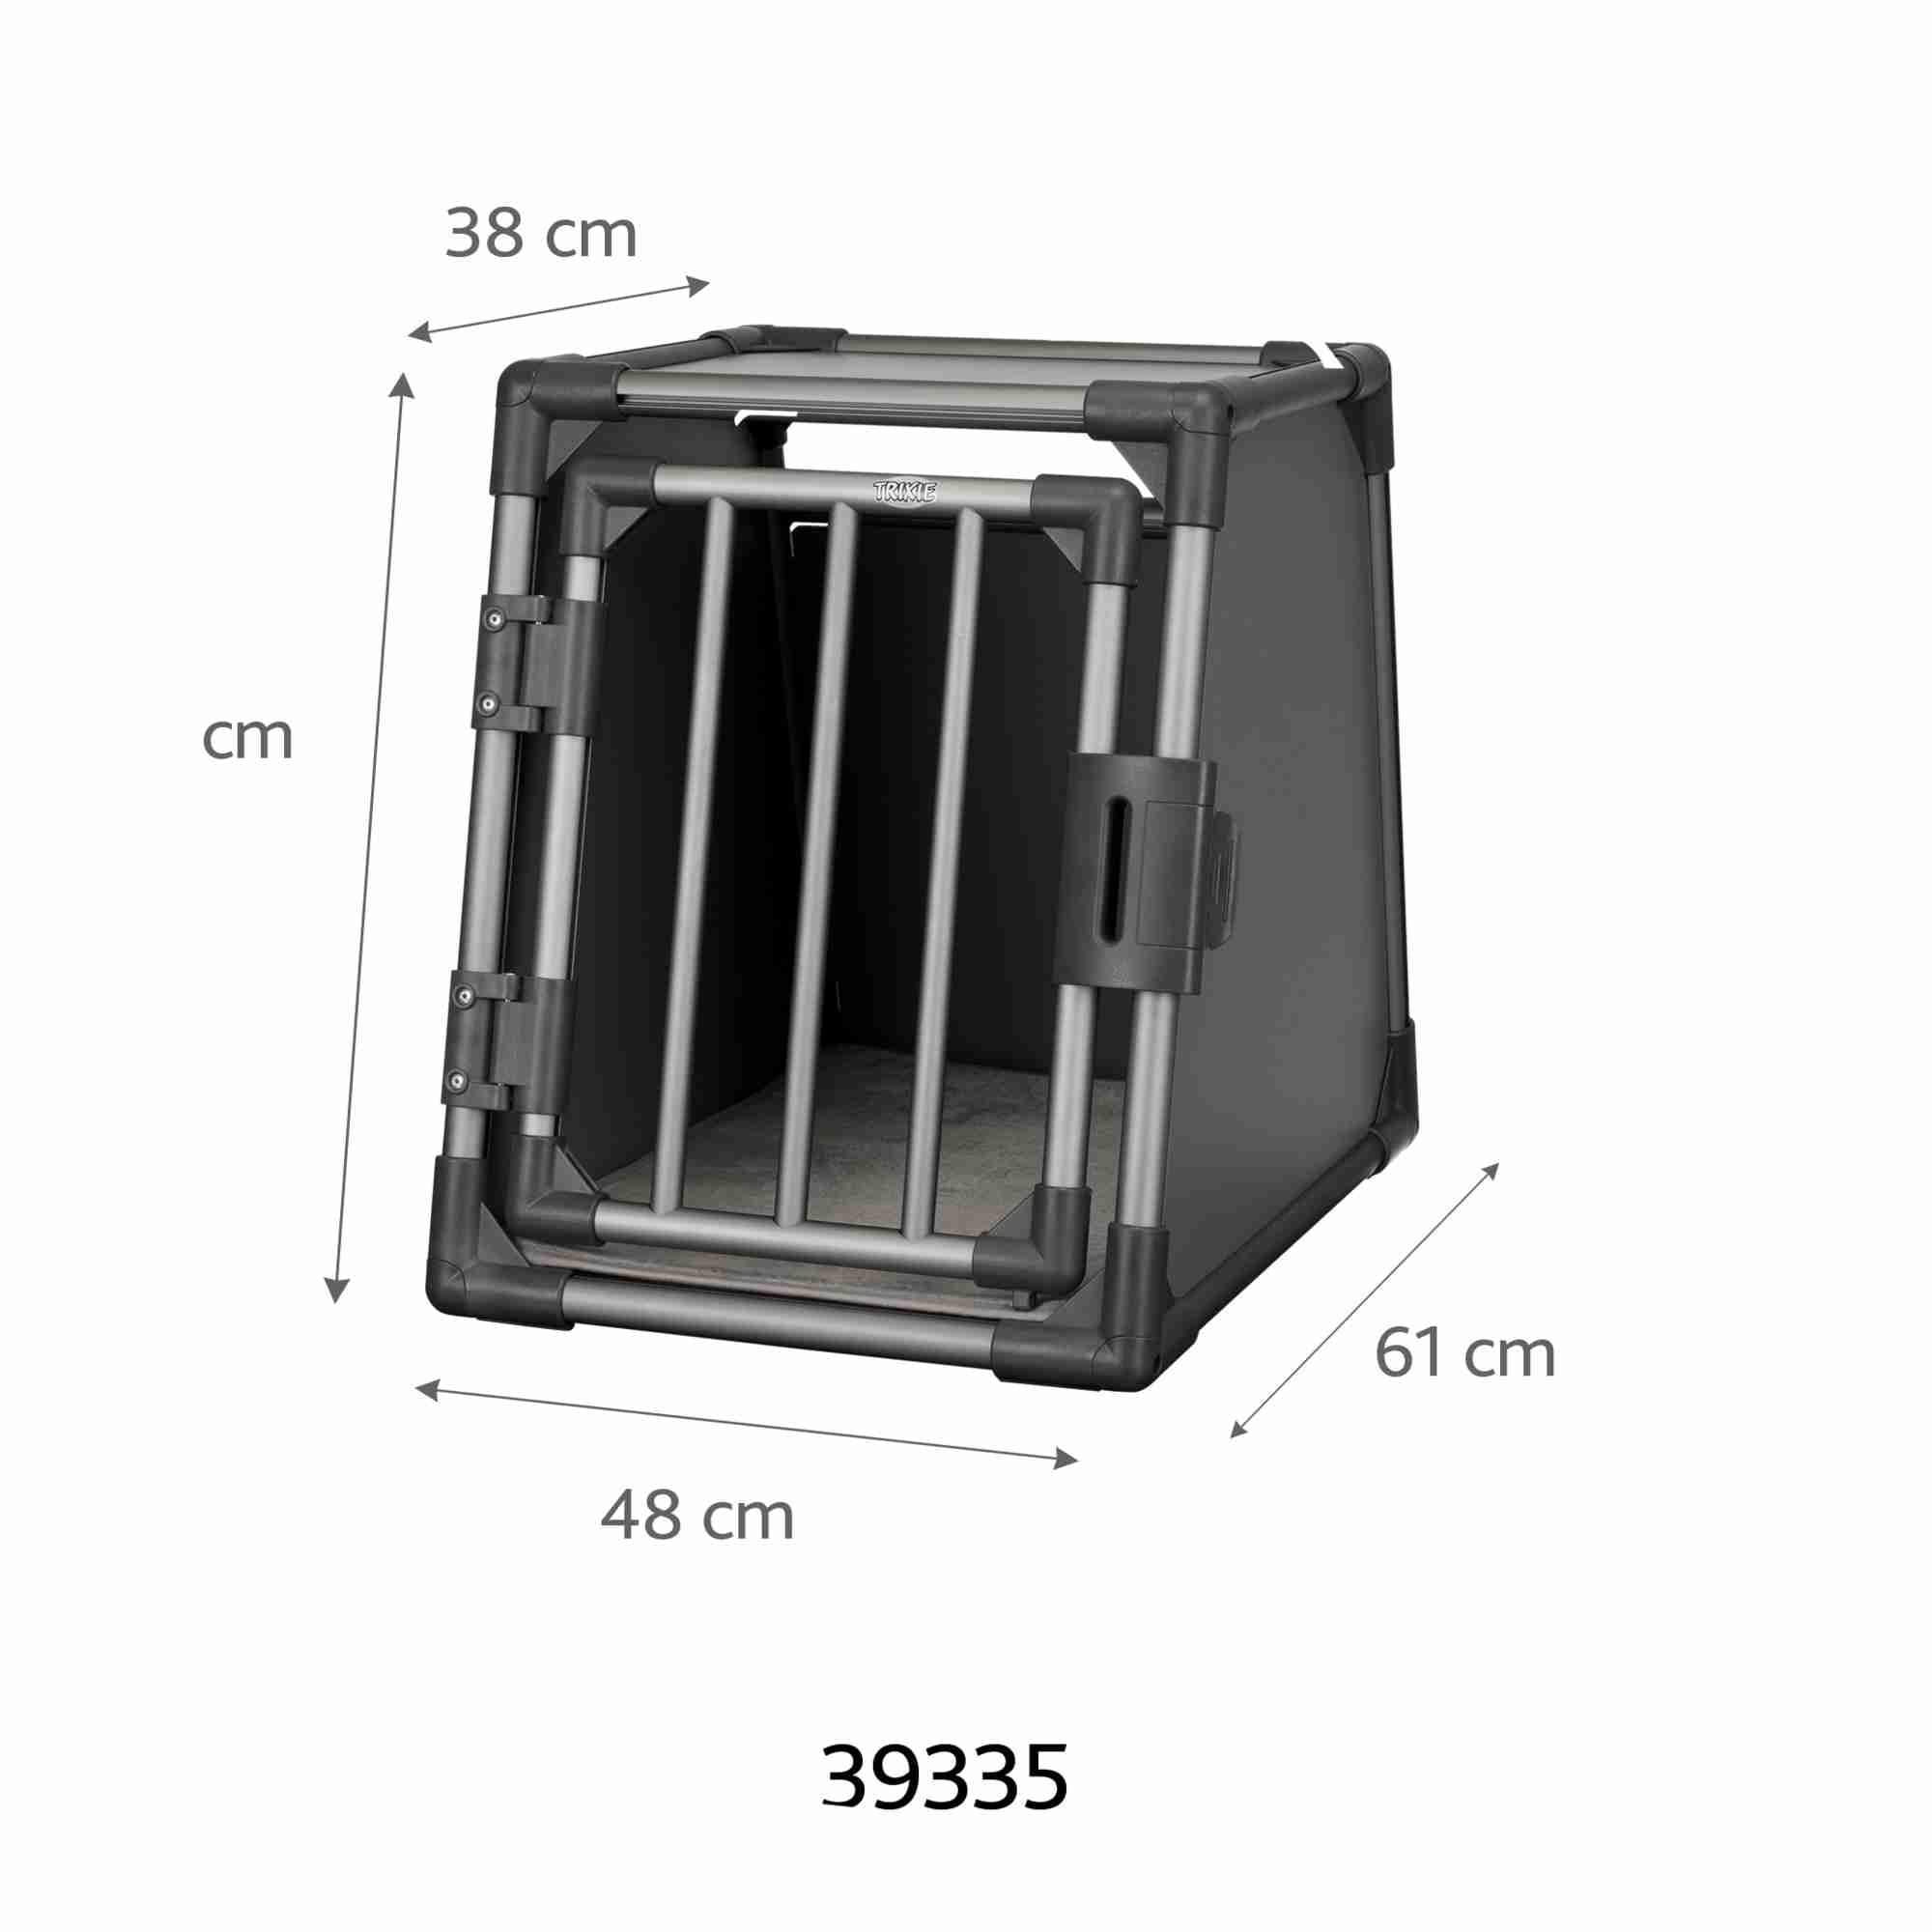 Trixie Vervoersbox Aluminium 48x61x56 cm grafiet